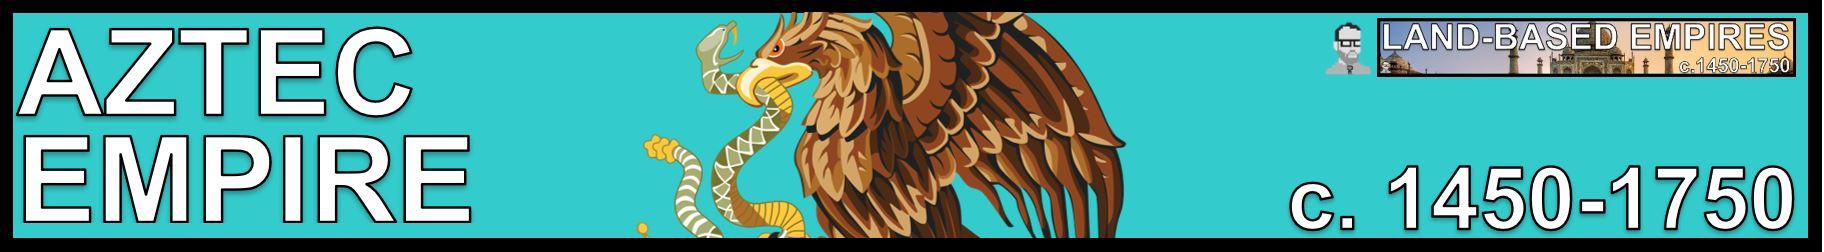 AZTEC BANNER LAND BASED EMPIRES AP WORLD HISTORY FREEMANPEDIA.JPG